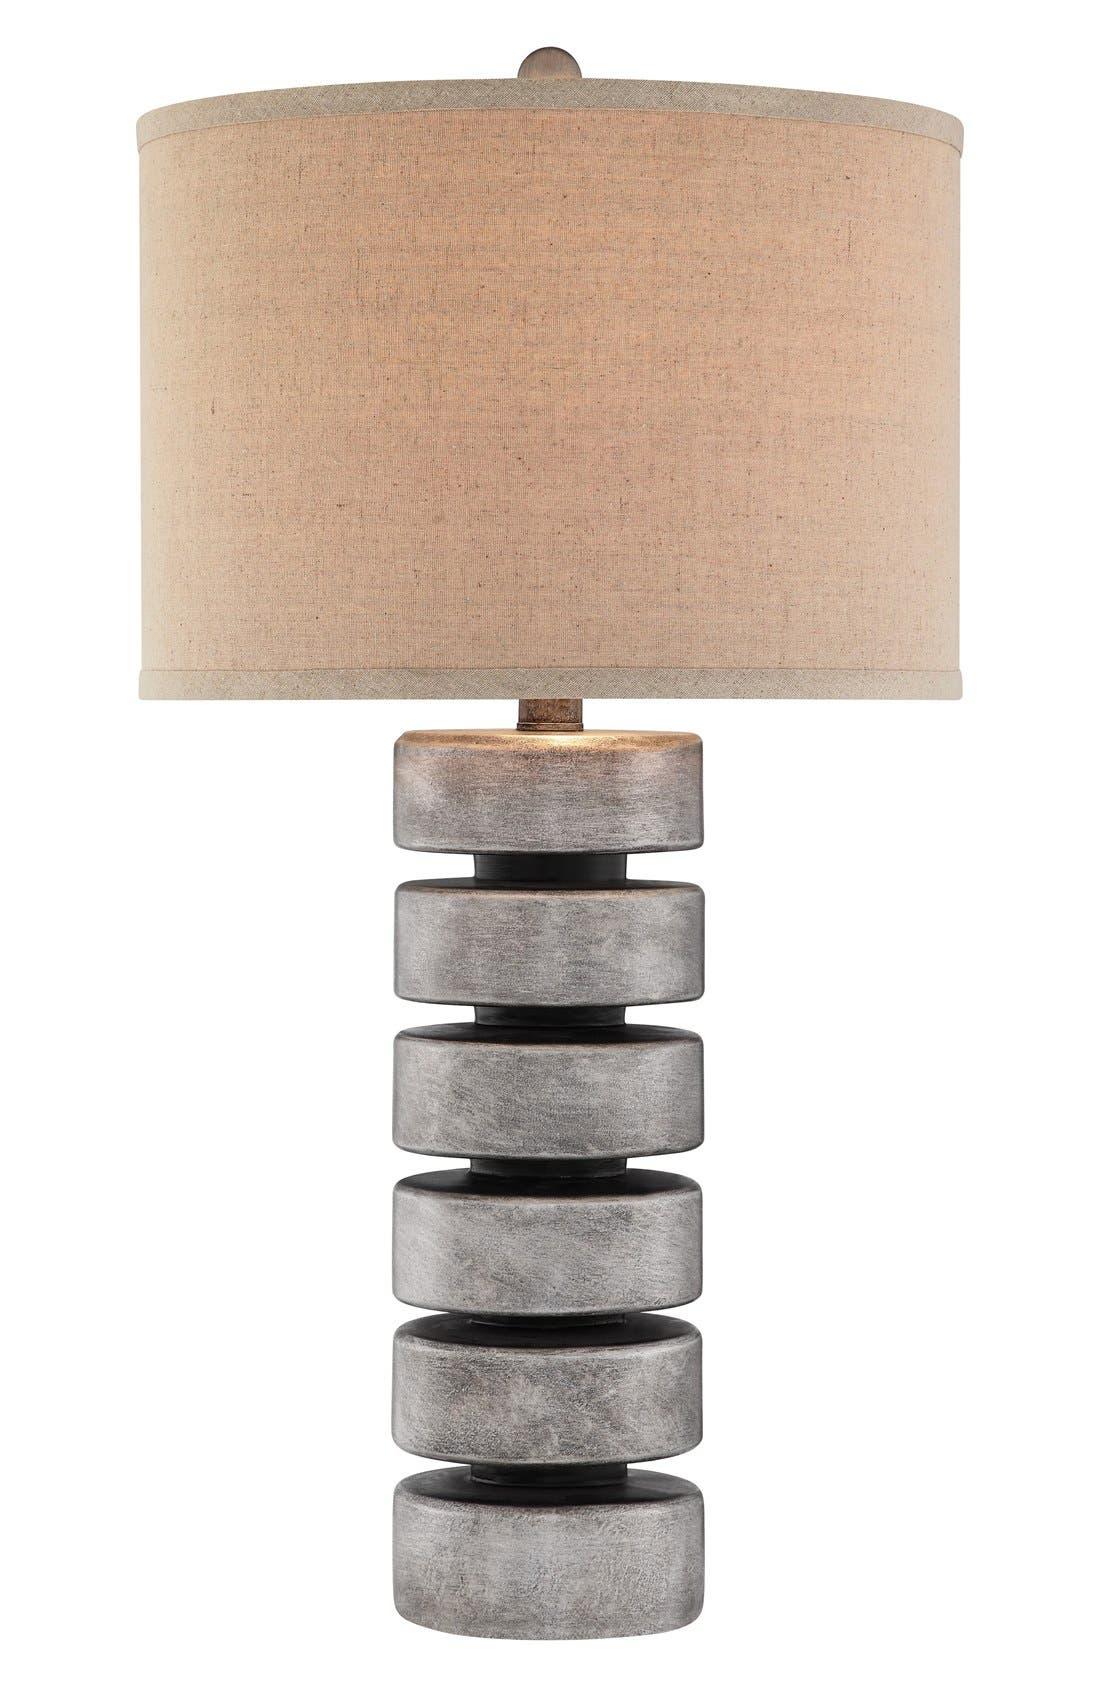 Alternate Image 1 Selected - JAlexander Lighting 'Stacked Disc' Table Lamp